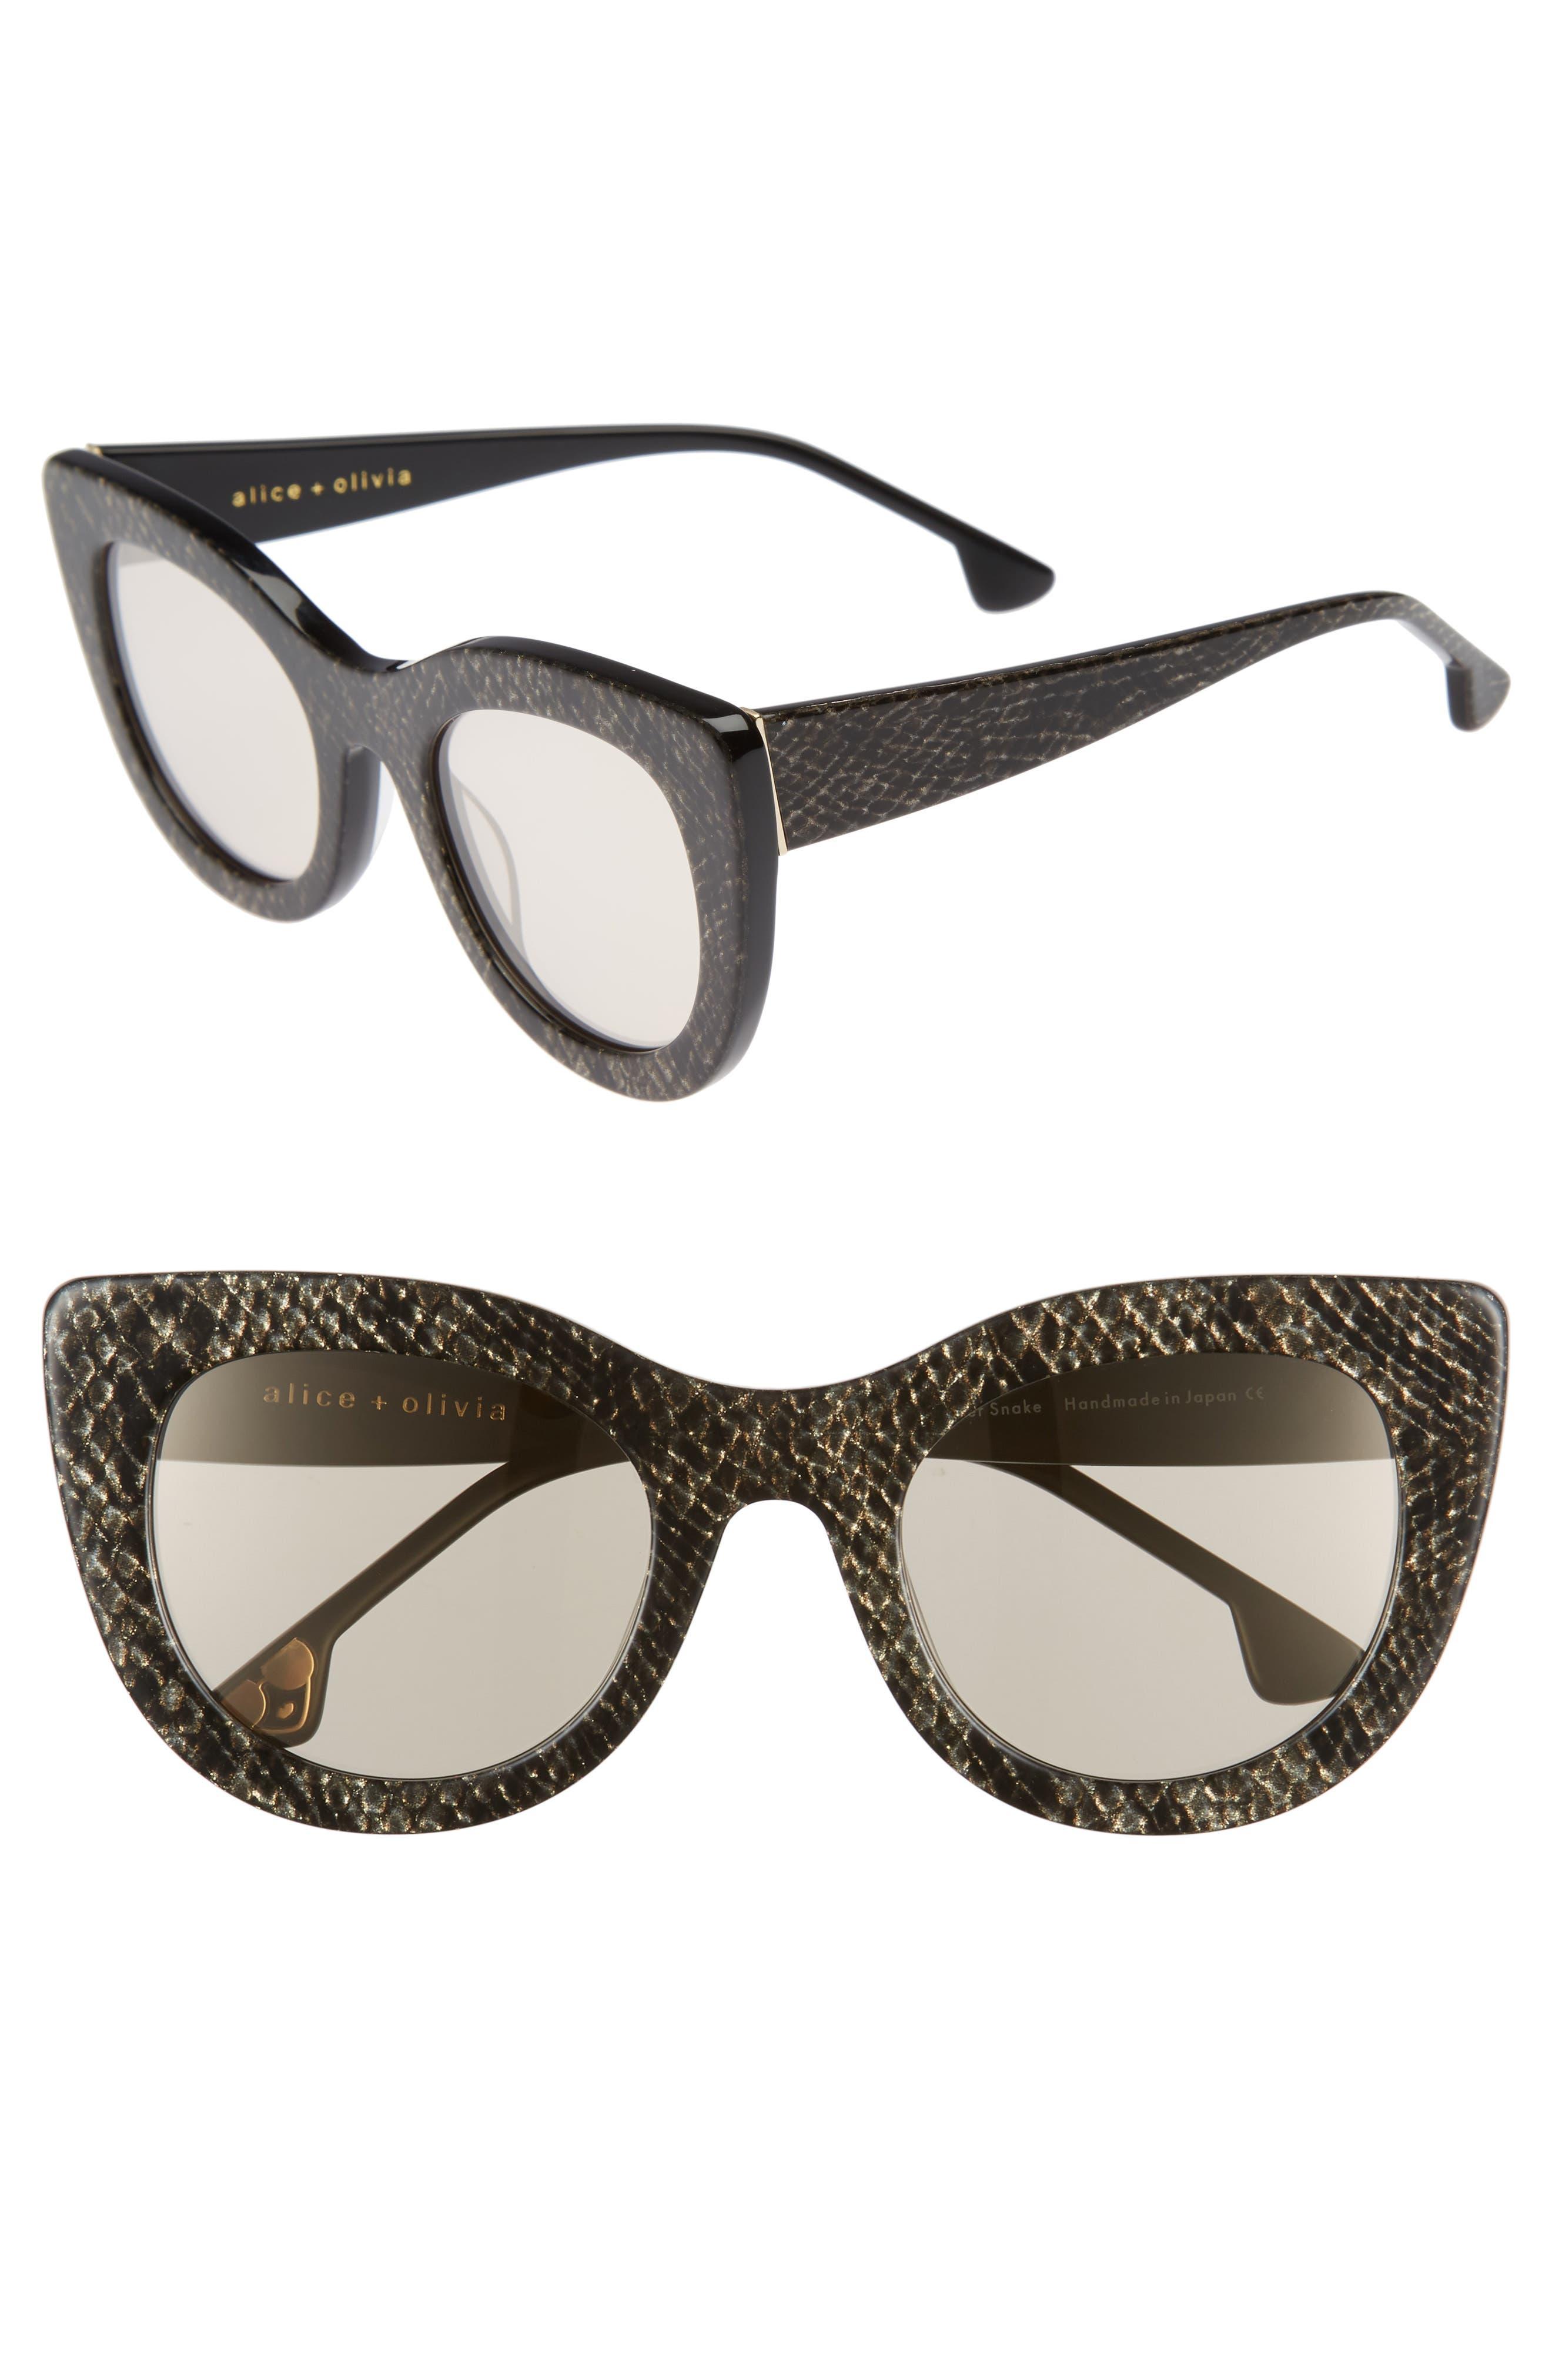 Delancey 51mm Cat Eye Sunglasses,                             Main thumbnail 1, color,                             Silver Snake